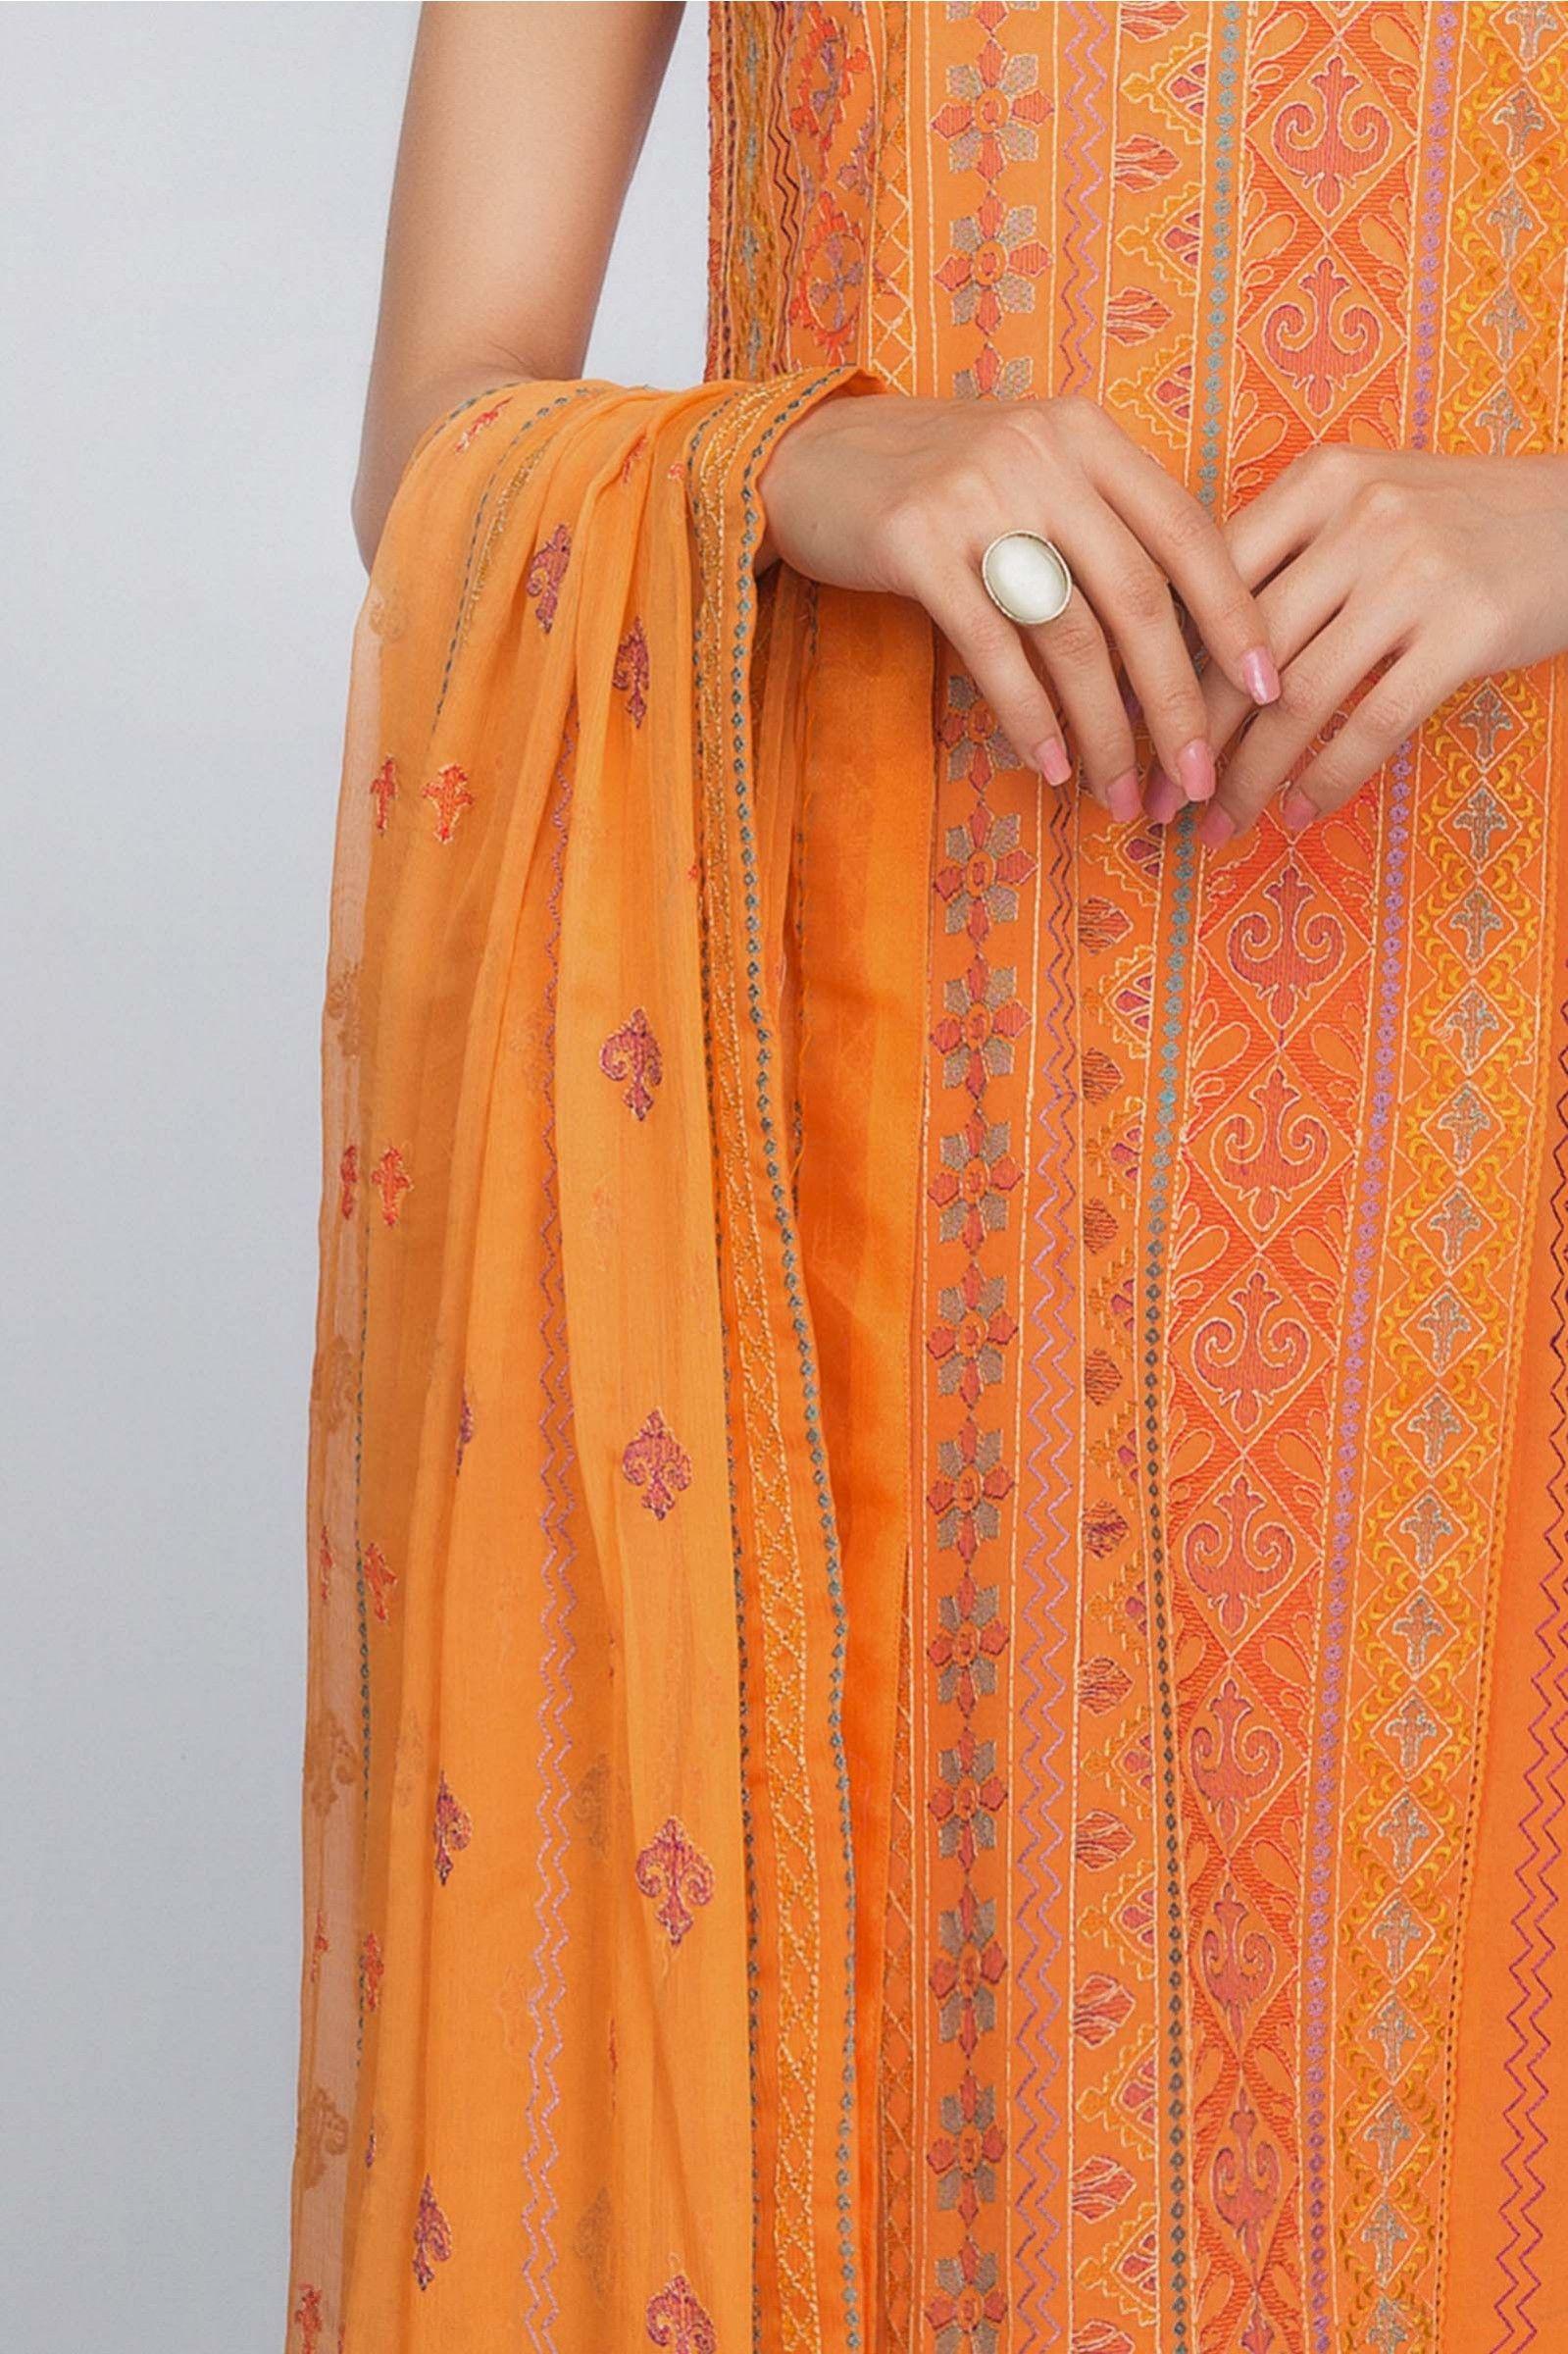 3082d0b57be Elegant orange 3 piece unstitched pret dress by Bareeze spring collection   springcollection  spring  readytowear  pretwear  unstitched  online  linen  ...